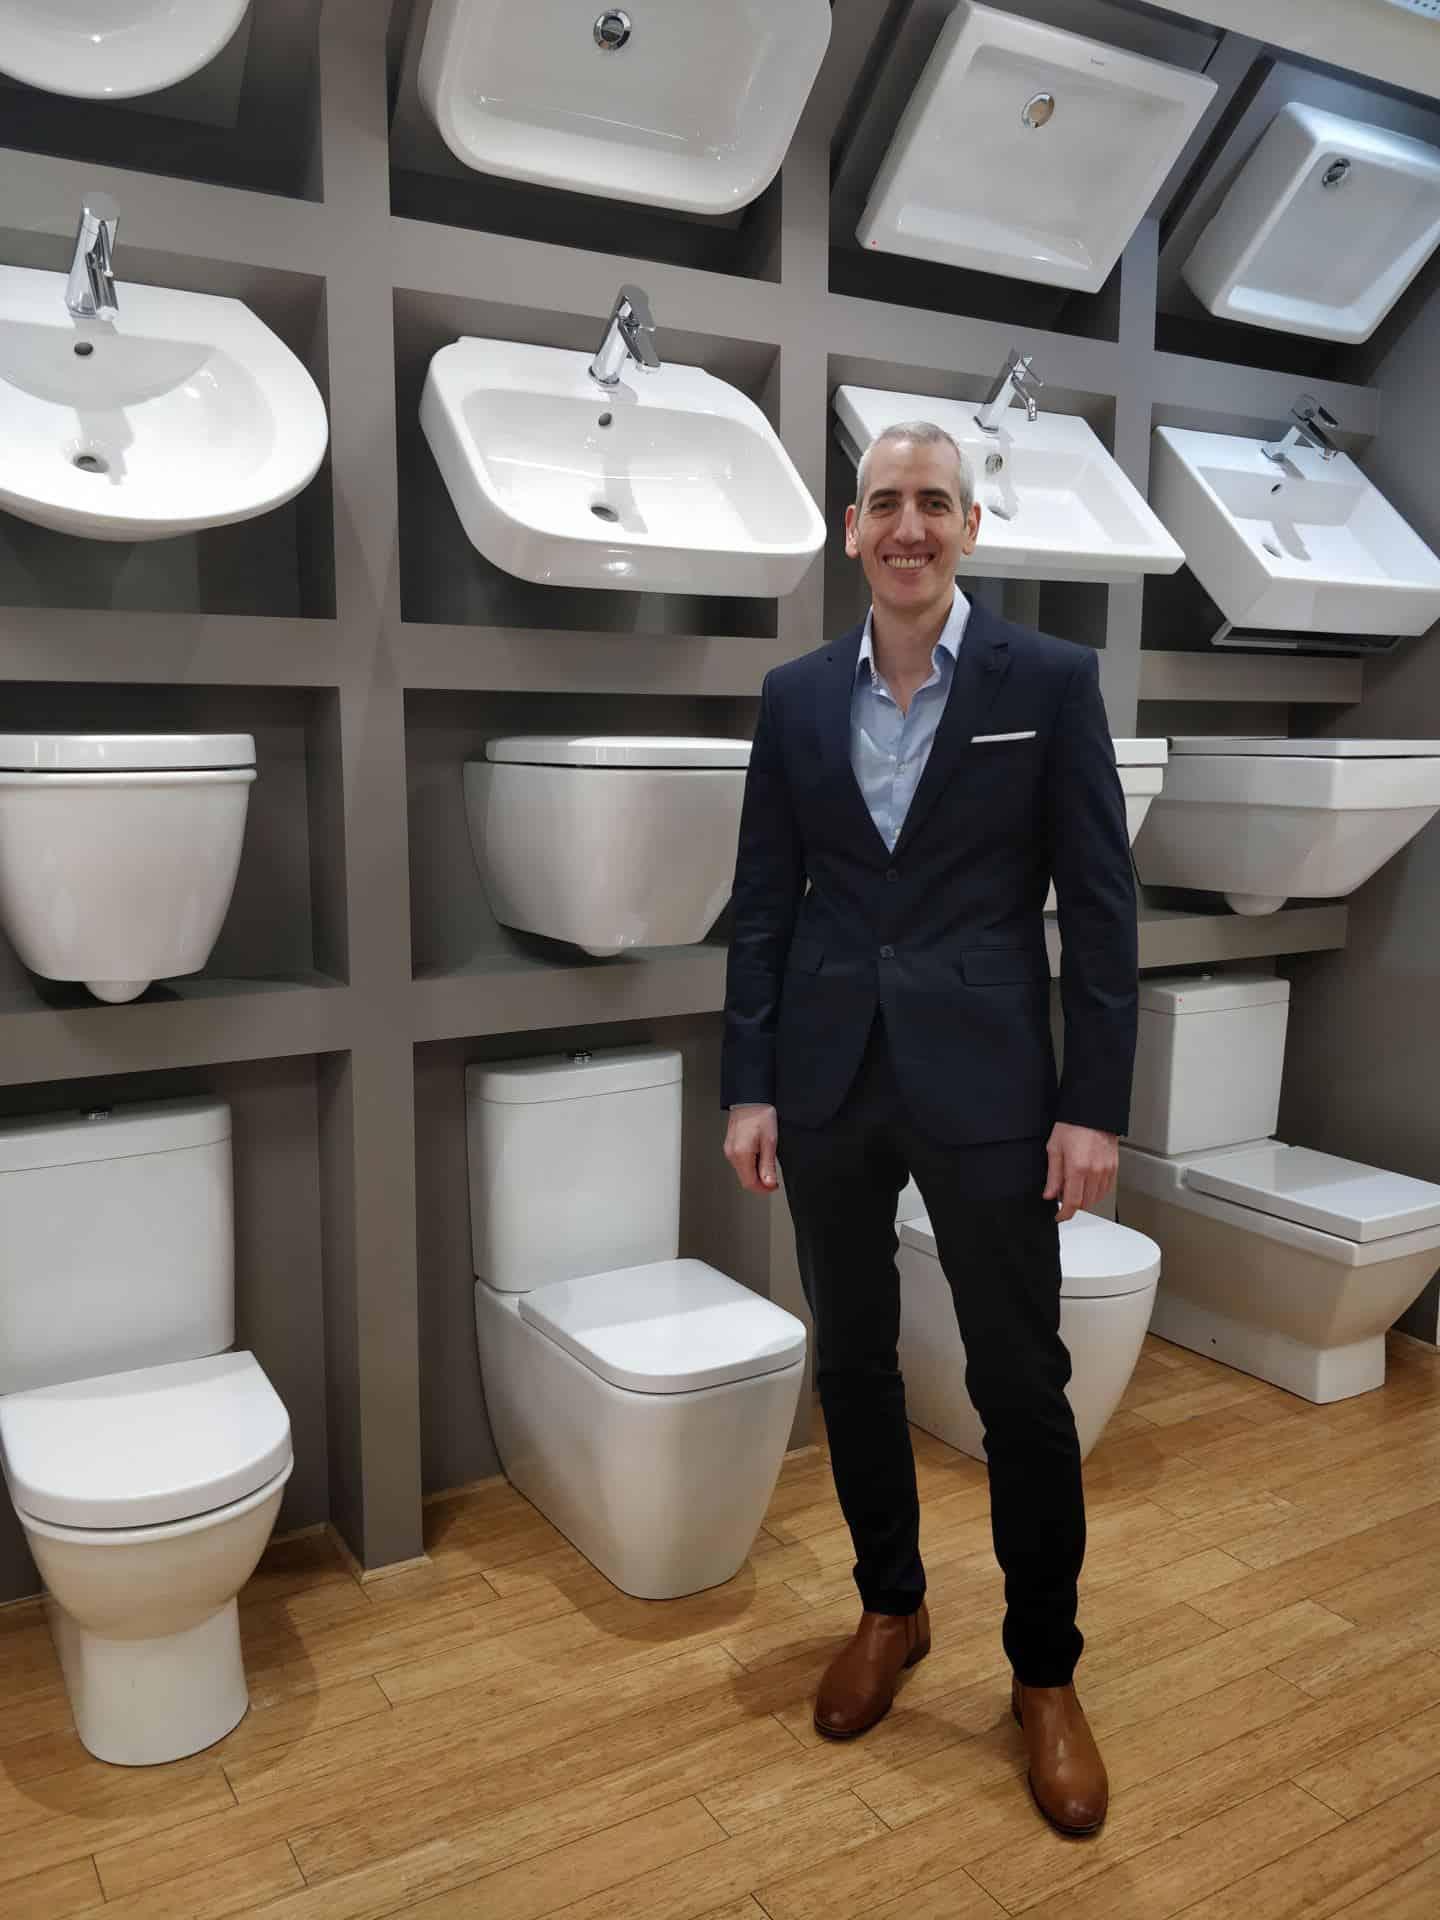 Brian Witcomb, founder of premium bathroom showroom, The Showroom Ltd